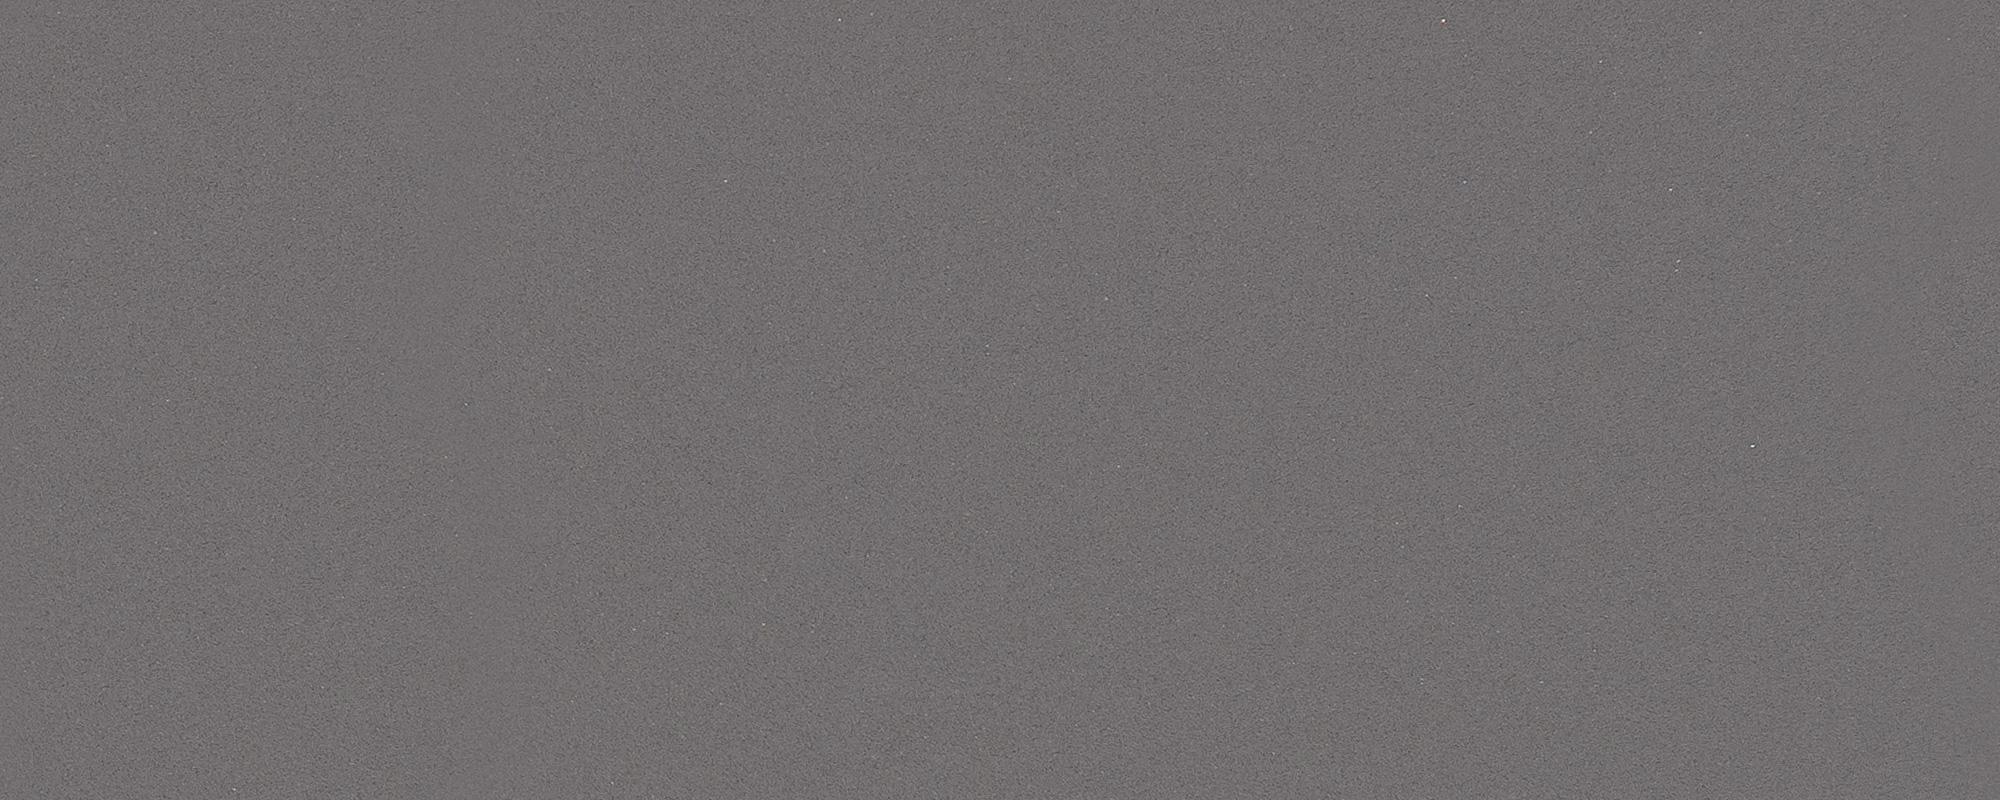 Smoke Grey Quartz Texture